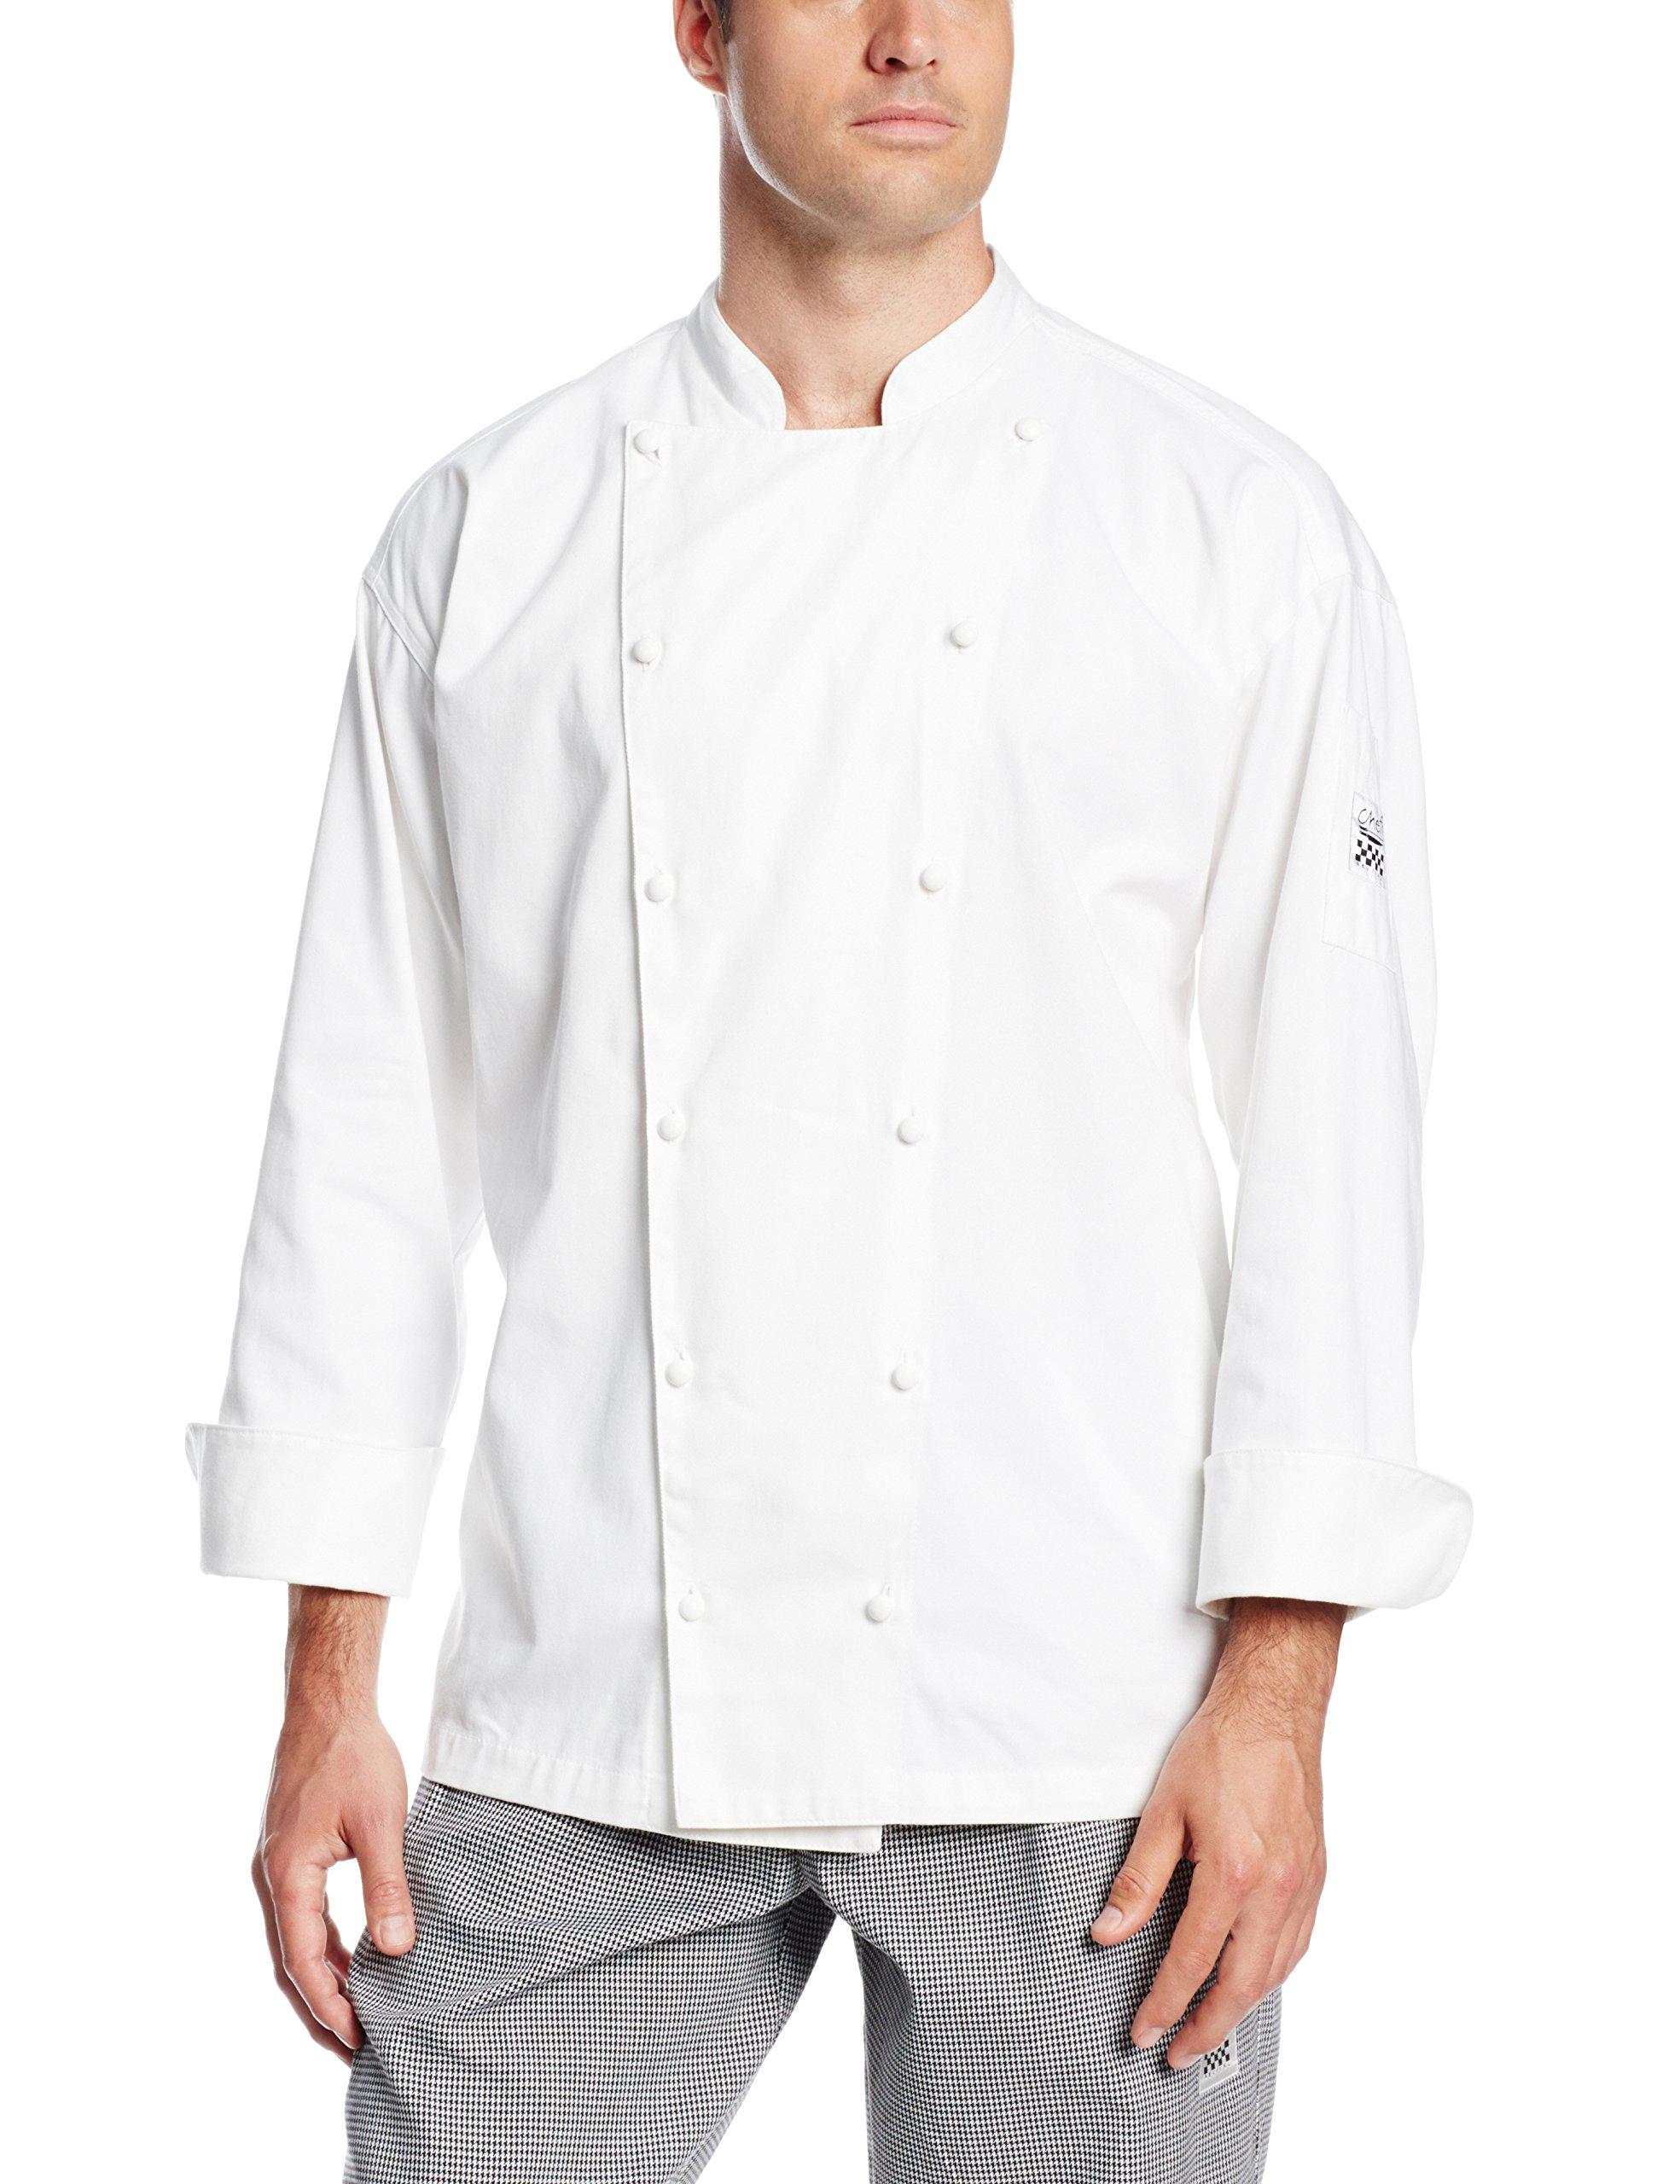 San Jamar J022 Cotton Classic Long Sleeve Chef Jacket with Push Through Button, 4X-Large, White by San Jamar